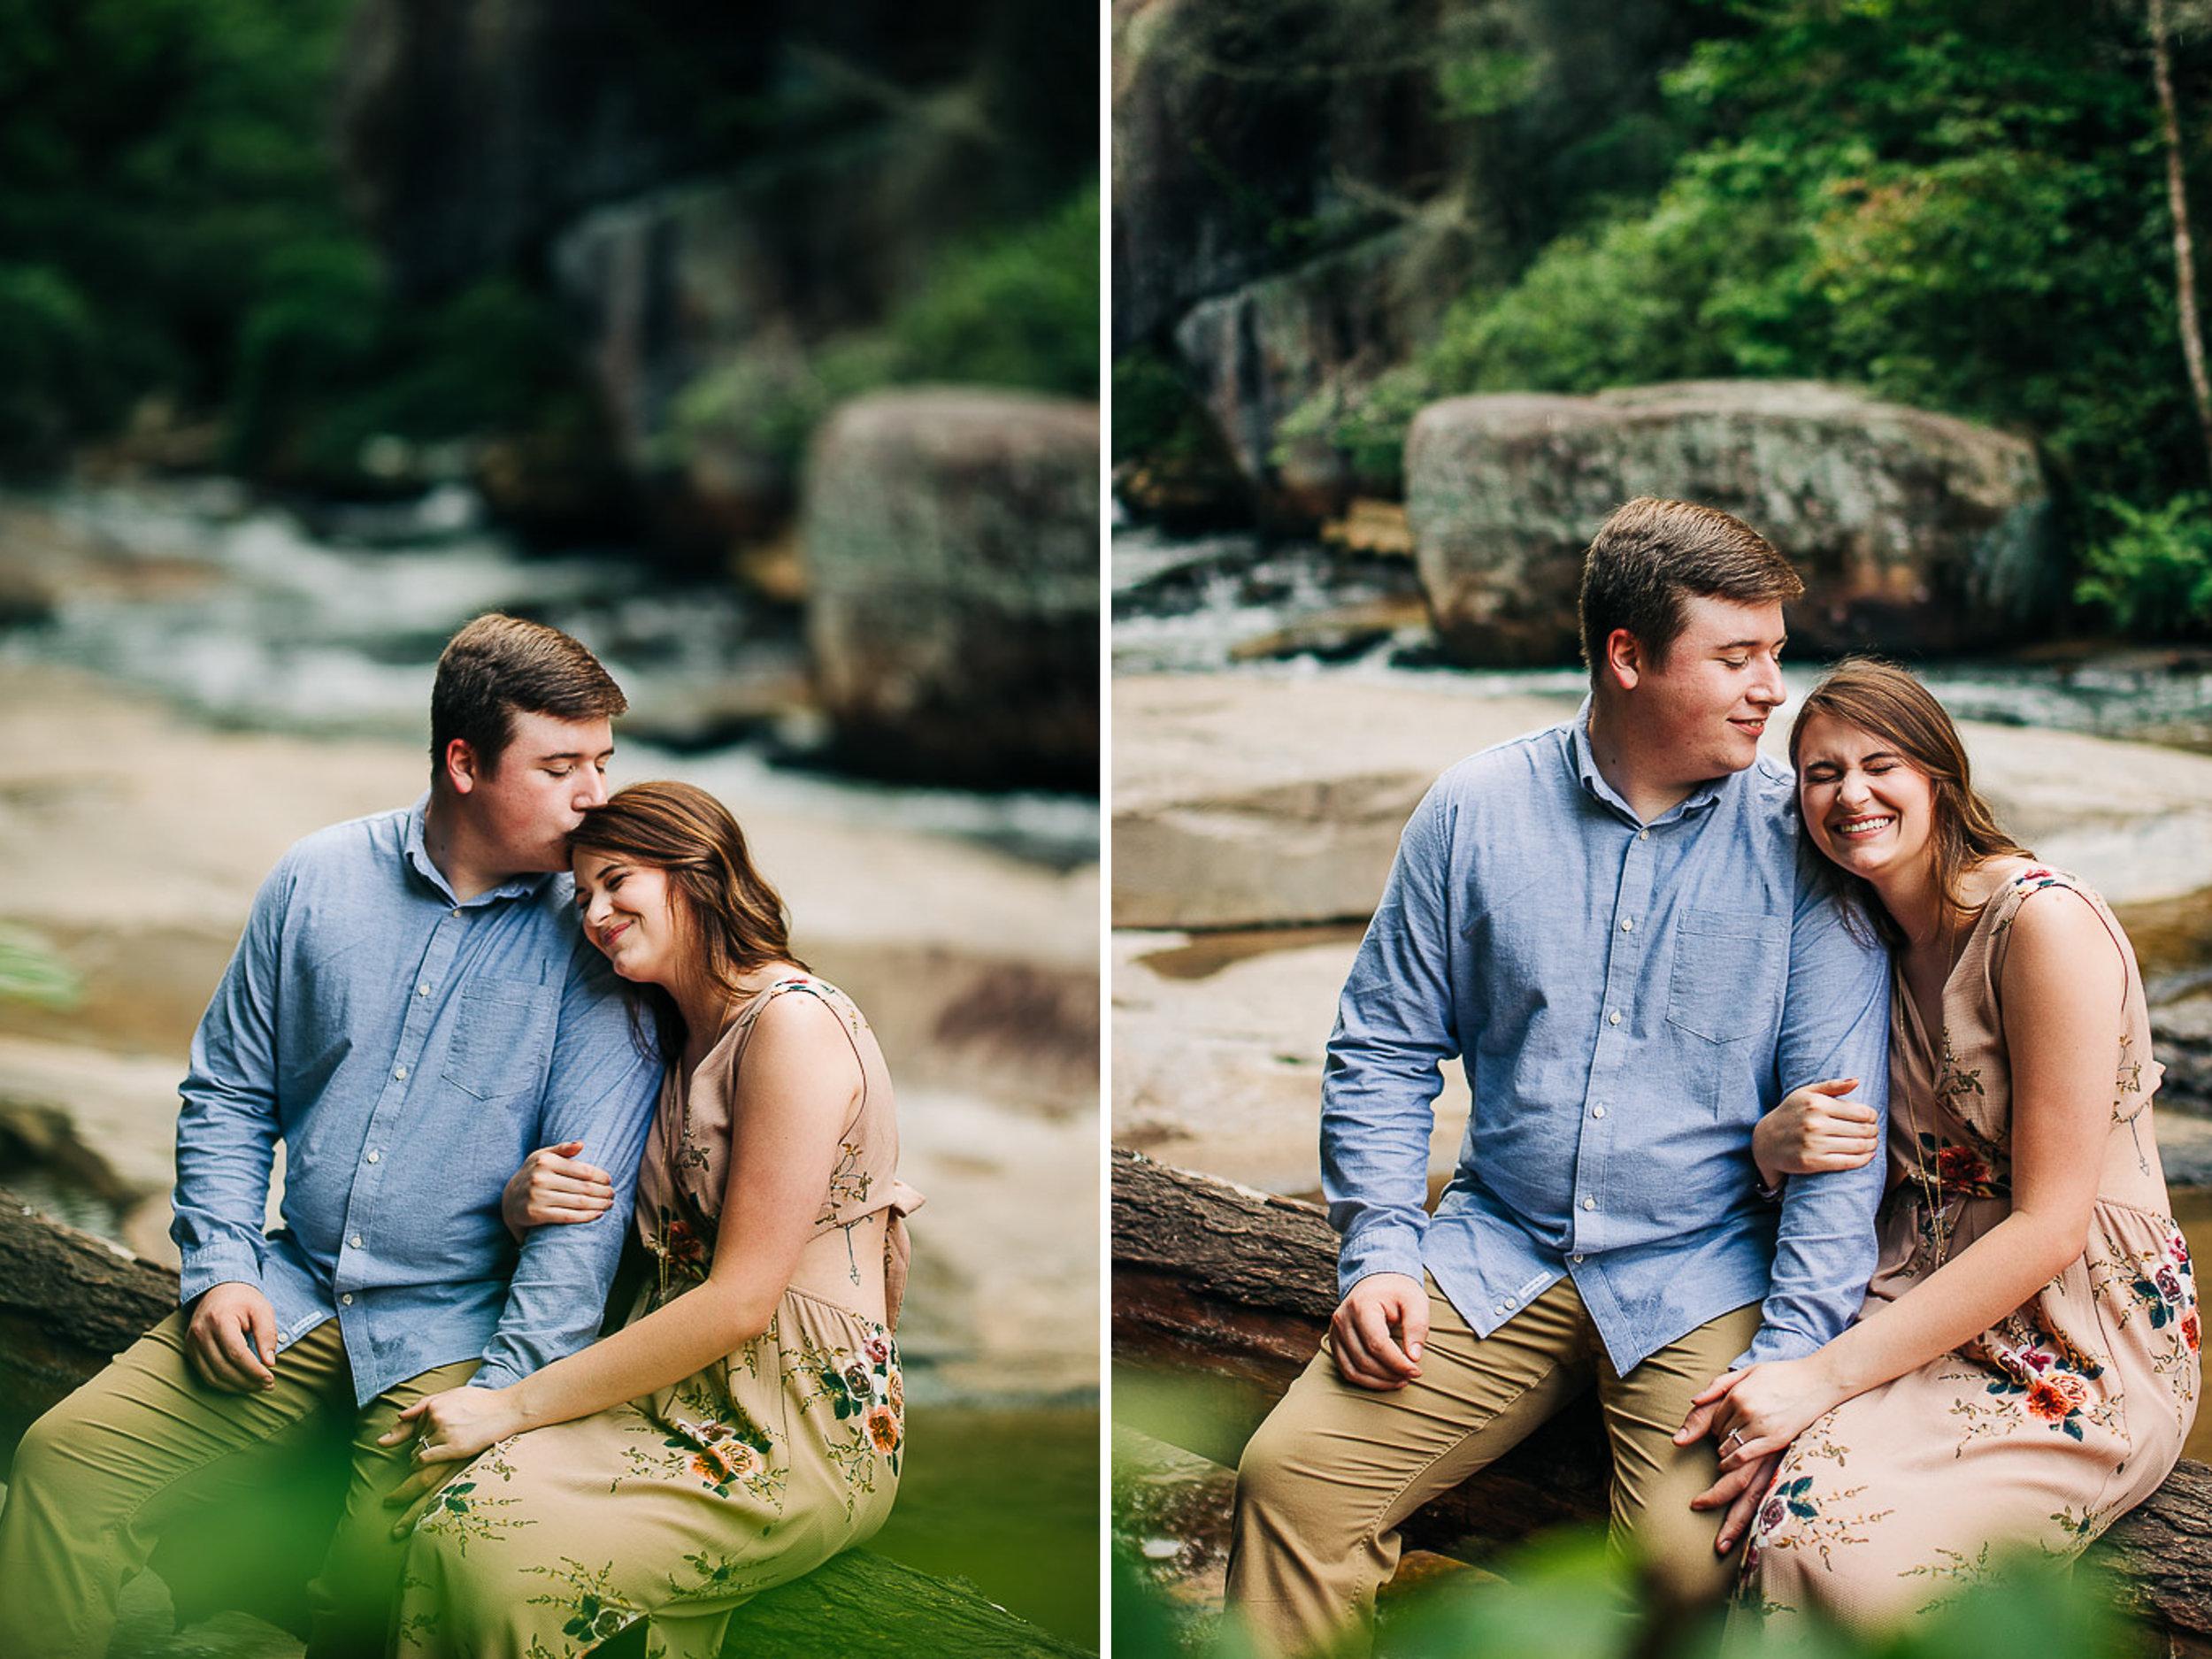 River Engagement Portraits, Summer Engagement Portraits, Engaged, South Carolina 03.jpg